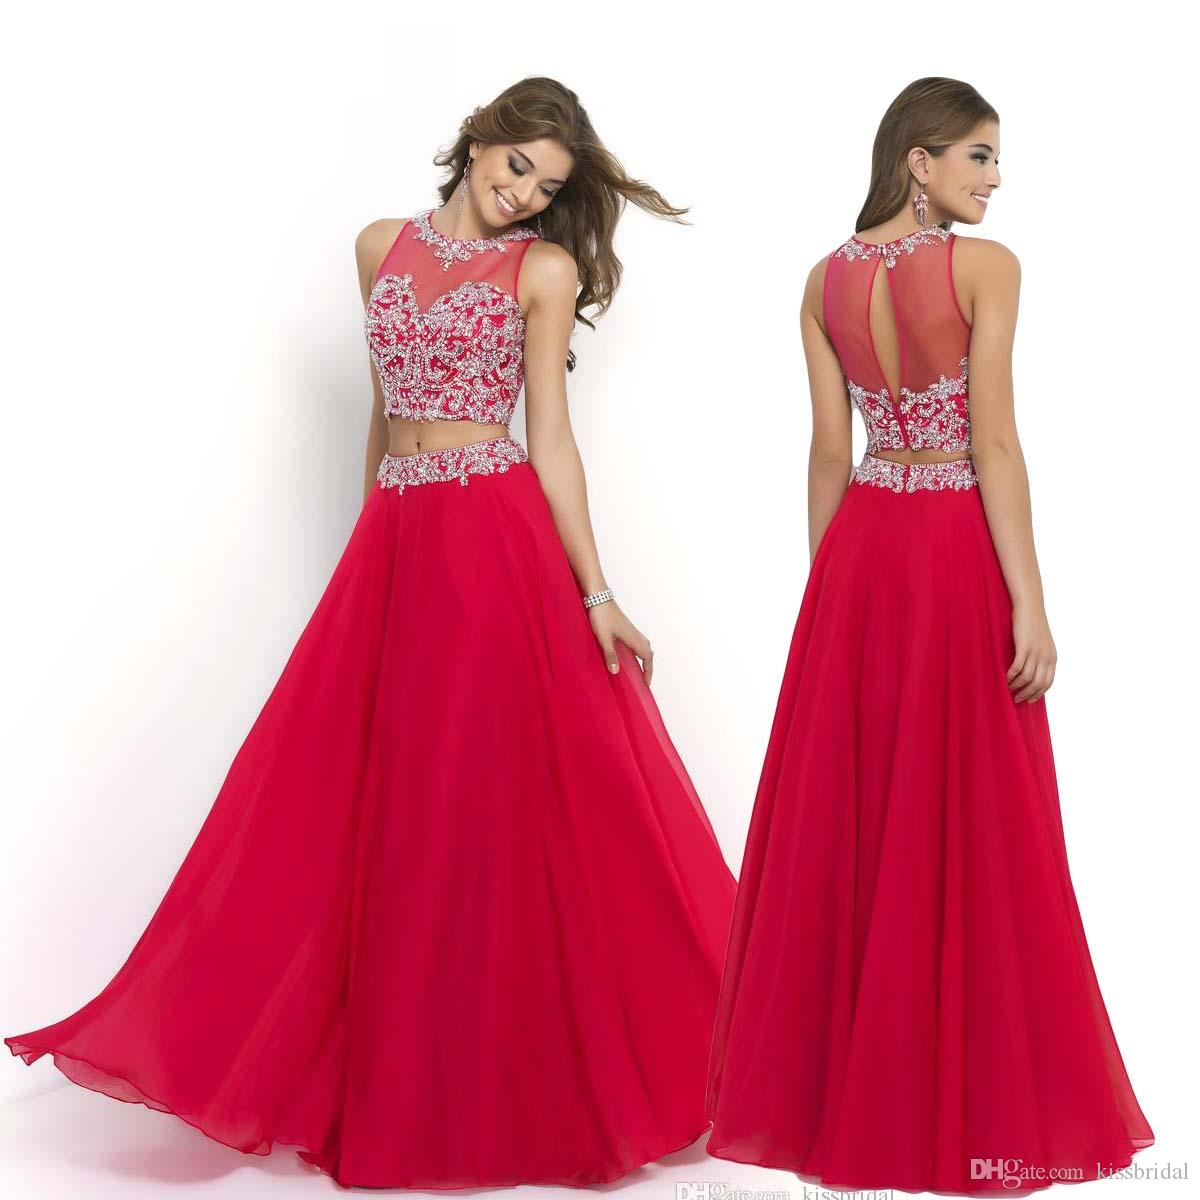 Davids Bridal Red Prom Dressesprom Dressesdressesss